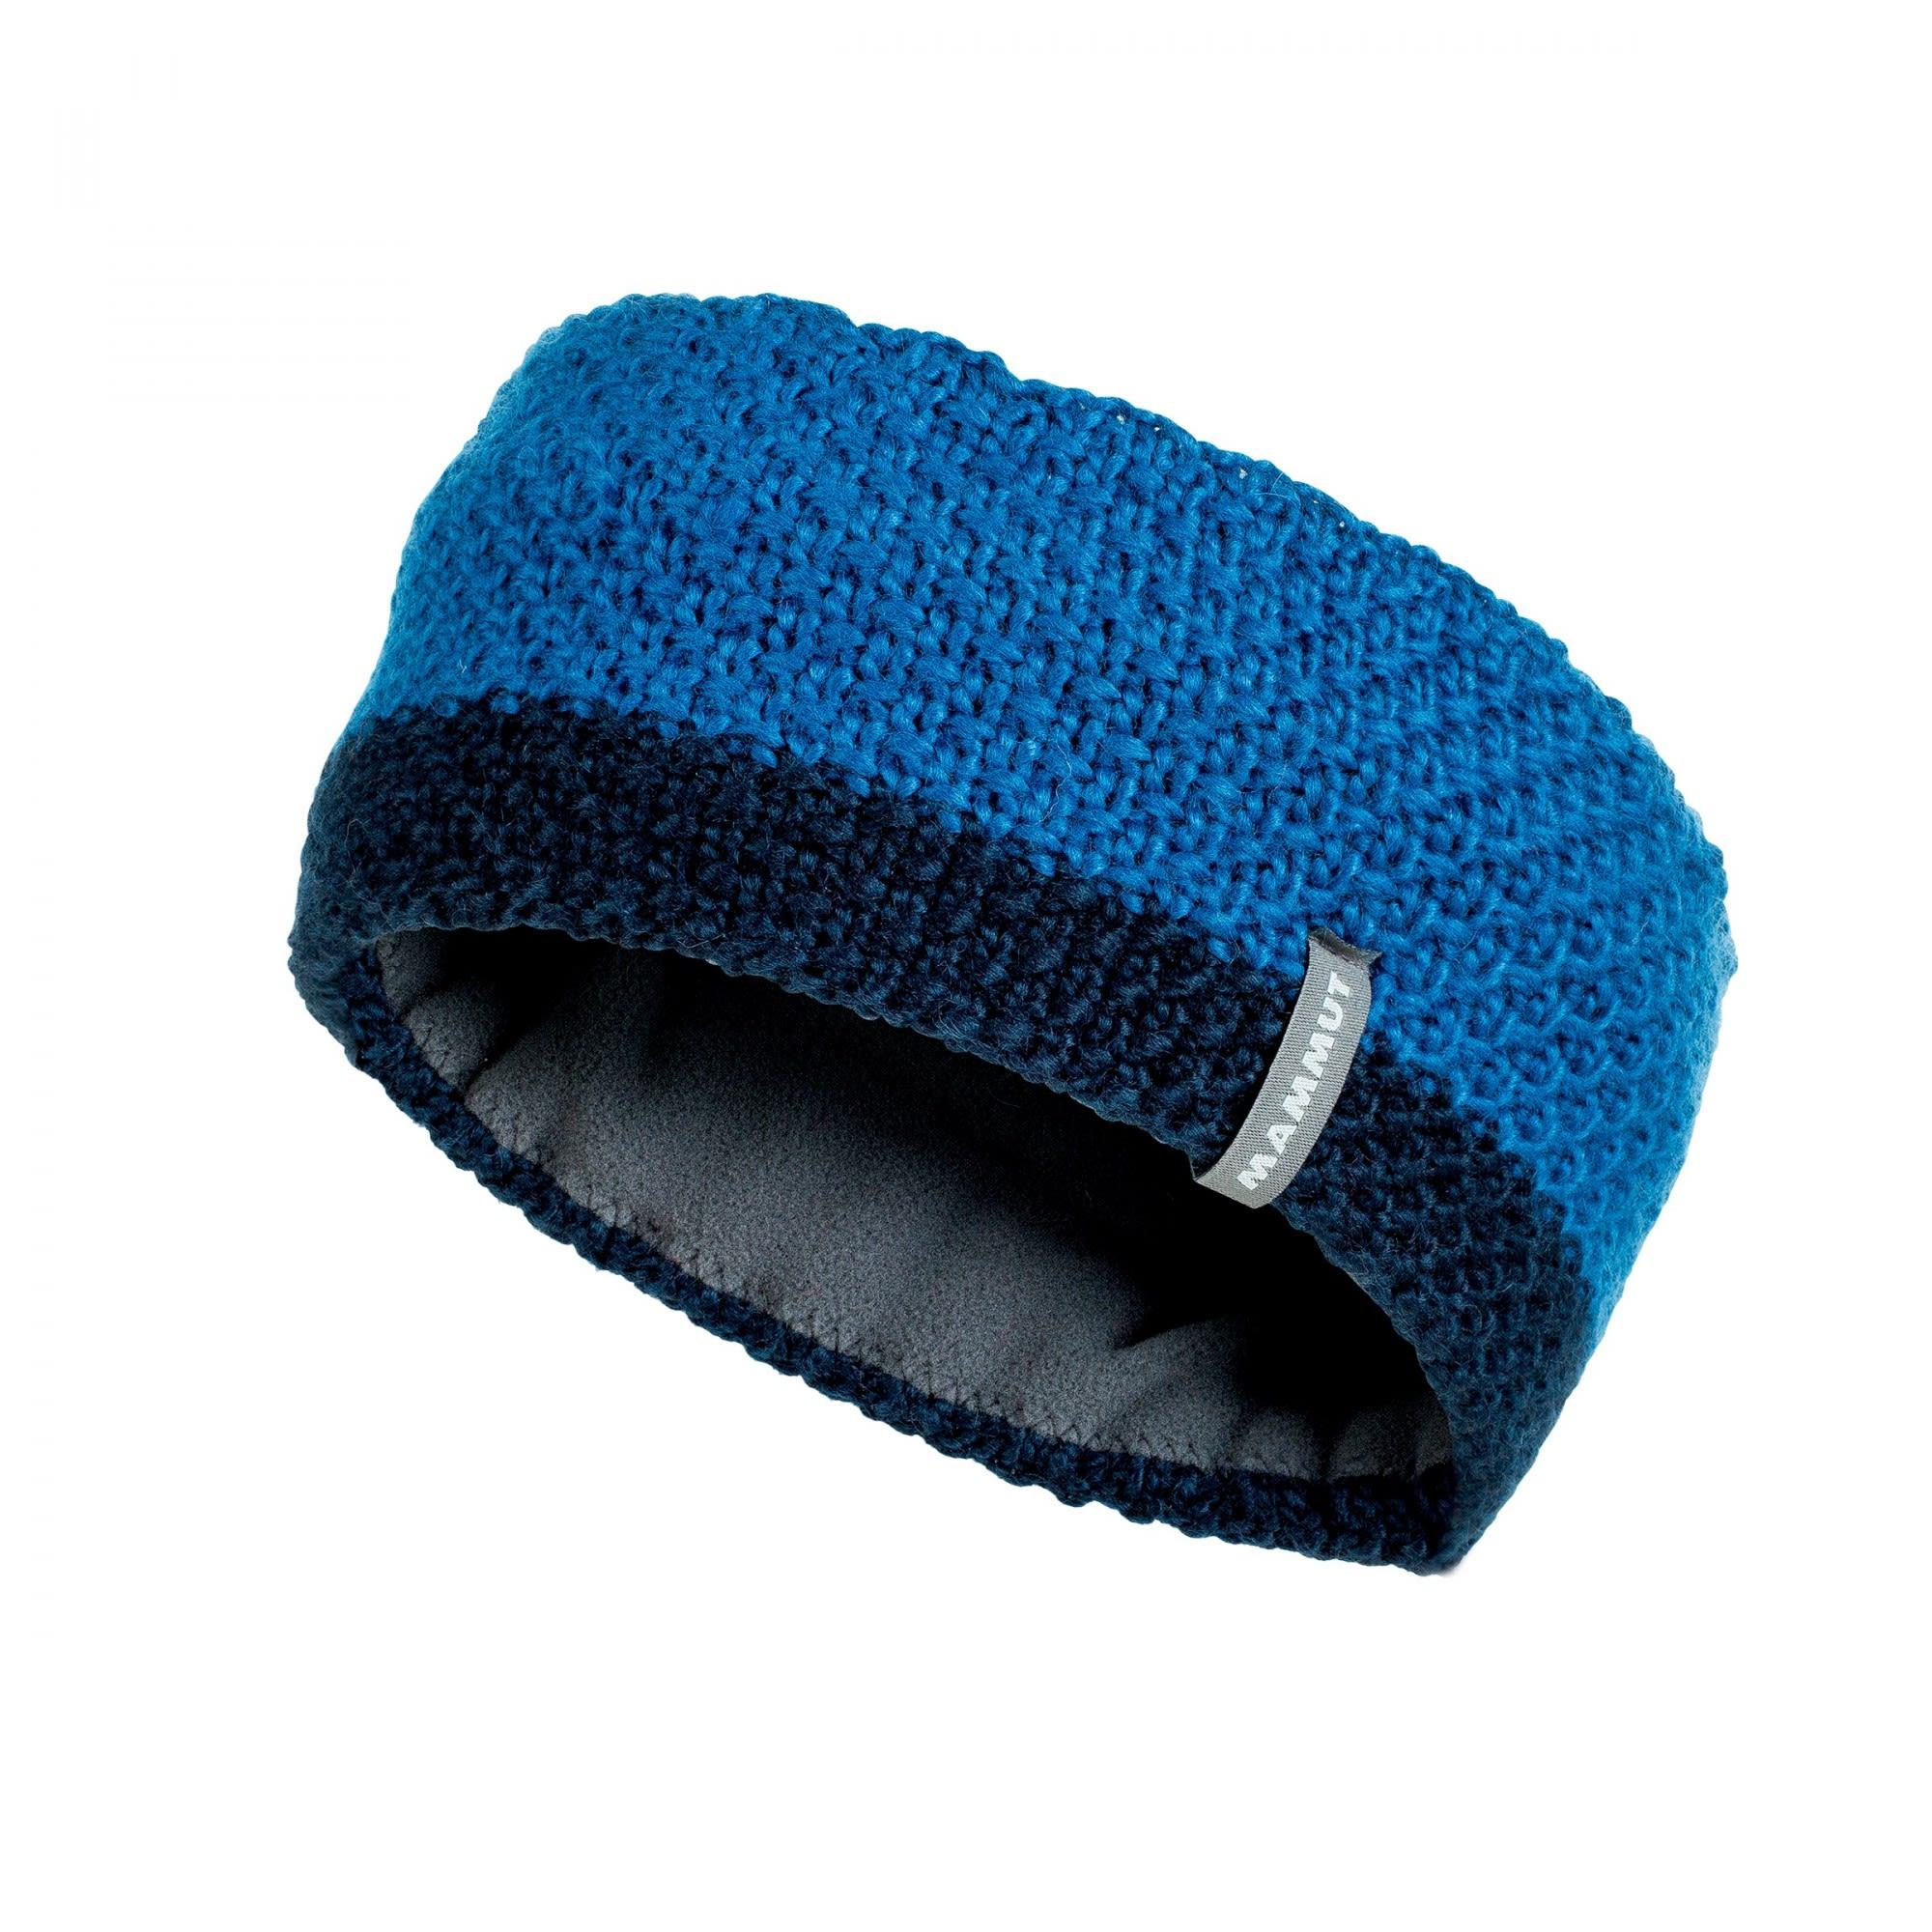 Mammut Alyeska Headband Blau, Accessoires, One Size